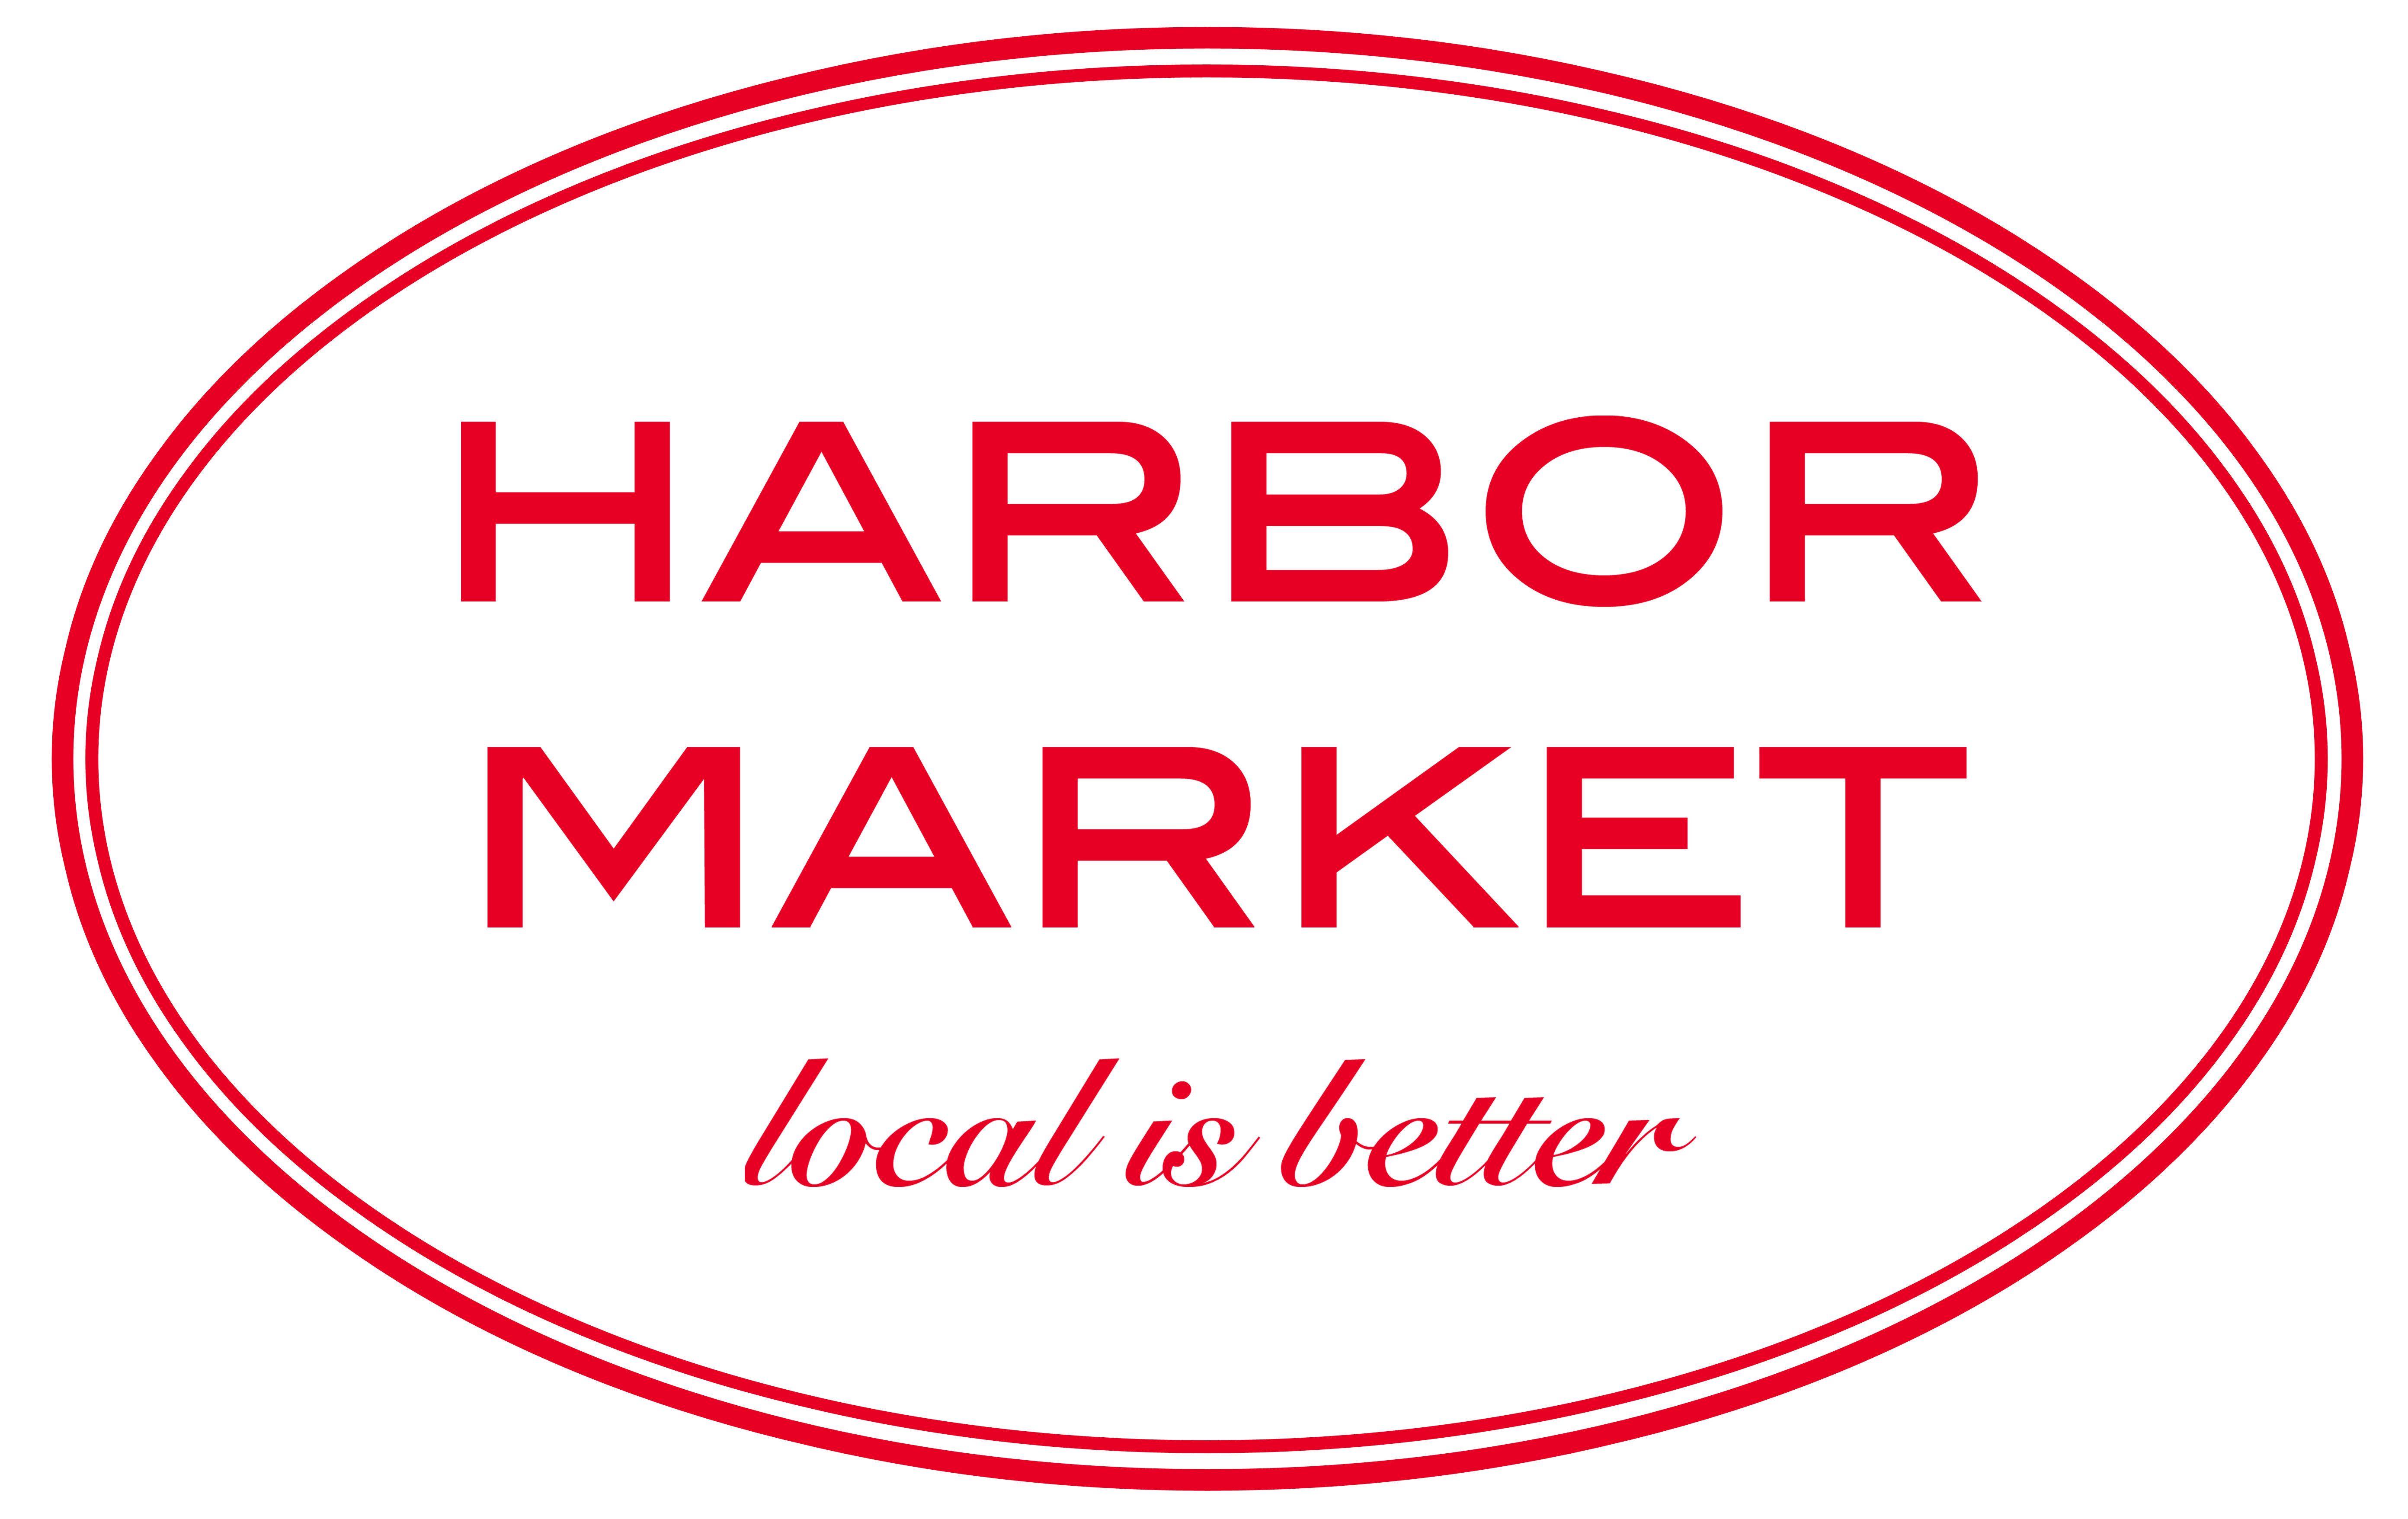 Farmer S Market In Benton Harbor Michigan Good To Visit